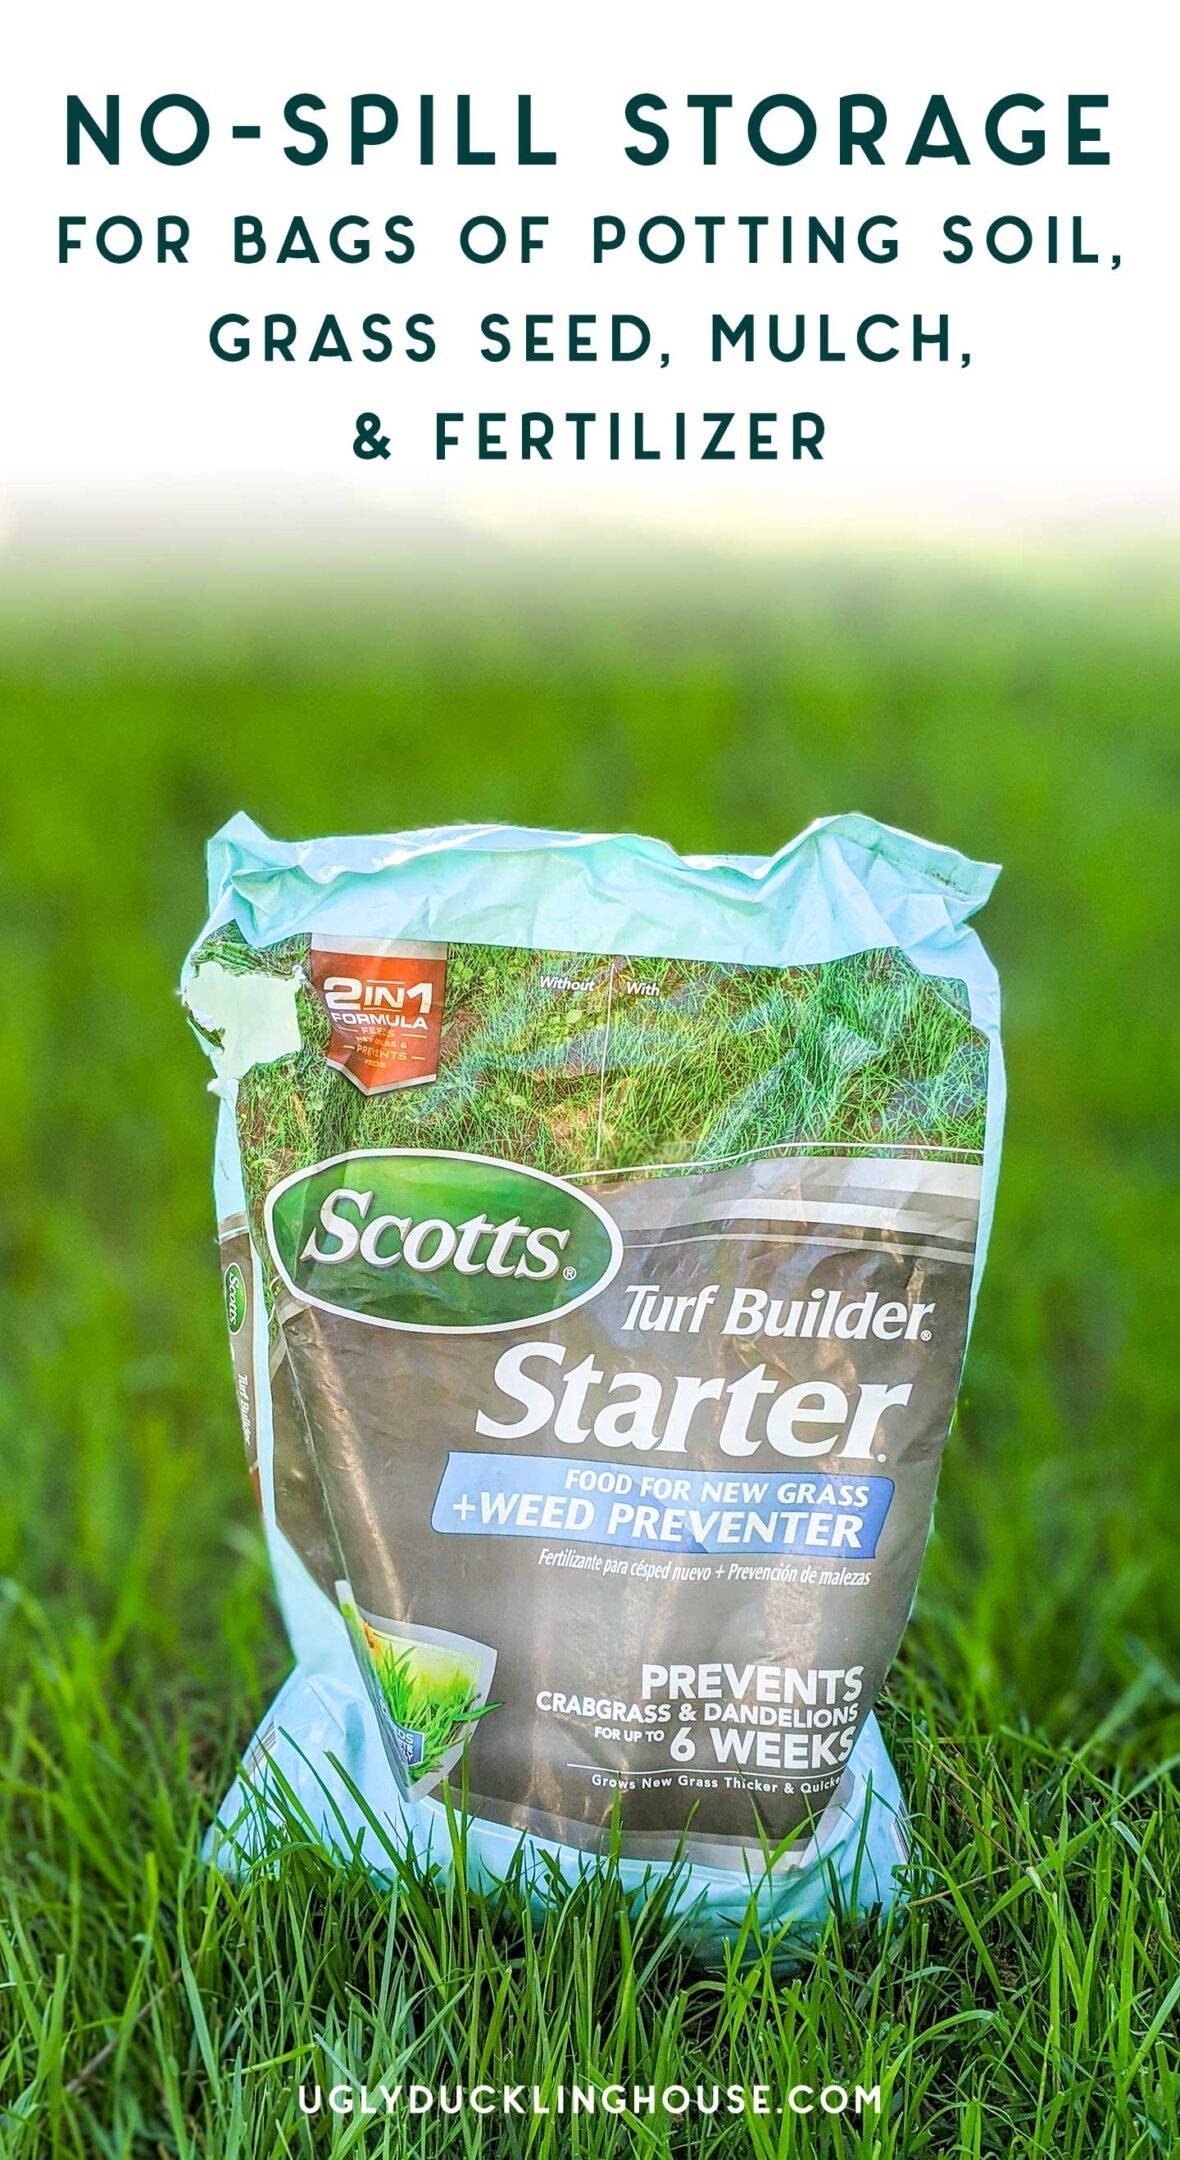 no-spill-storage-for-gardening-potting-soil-fertilizer-grass-seed